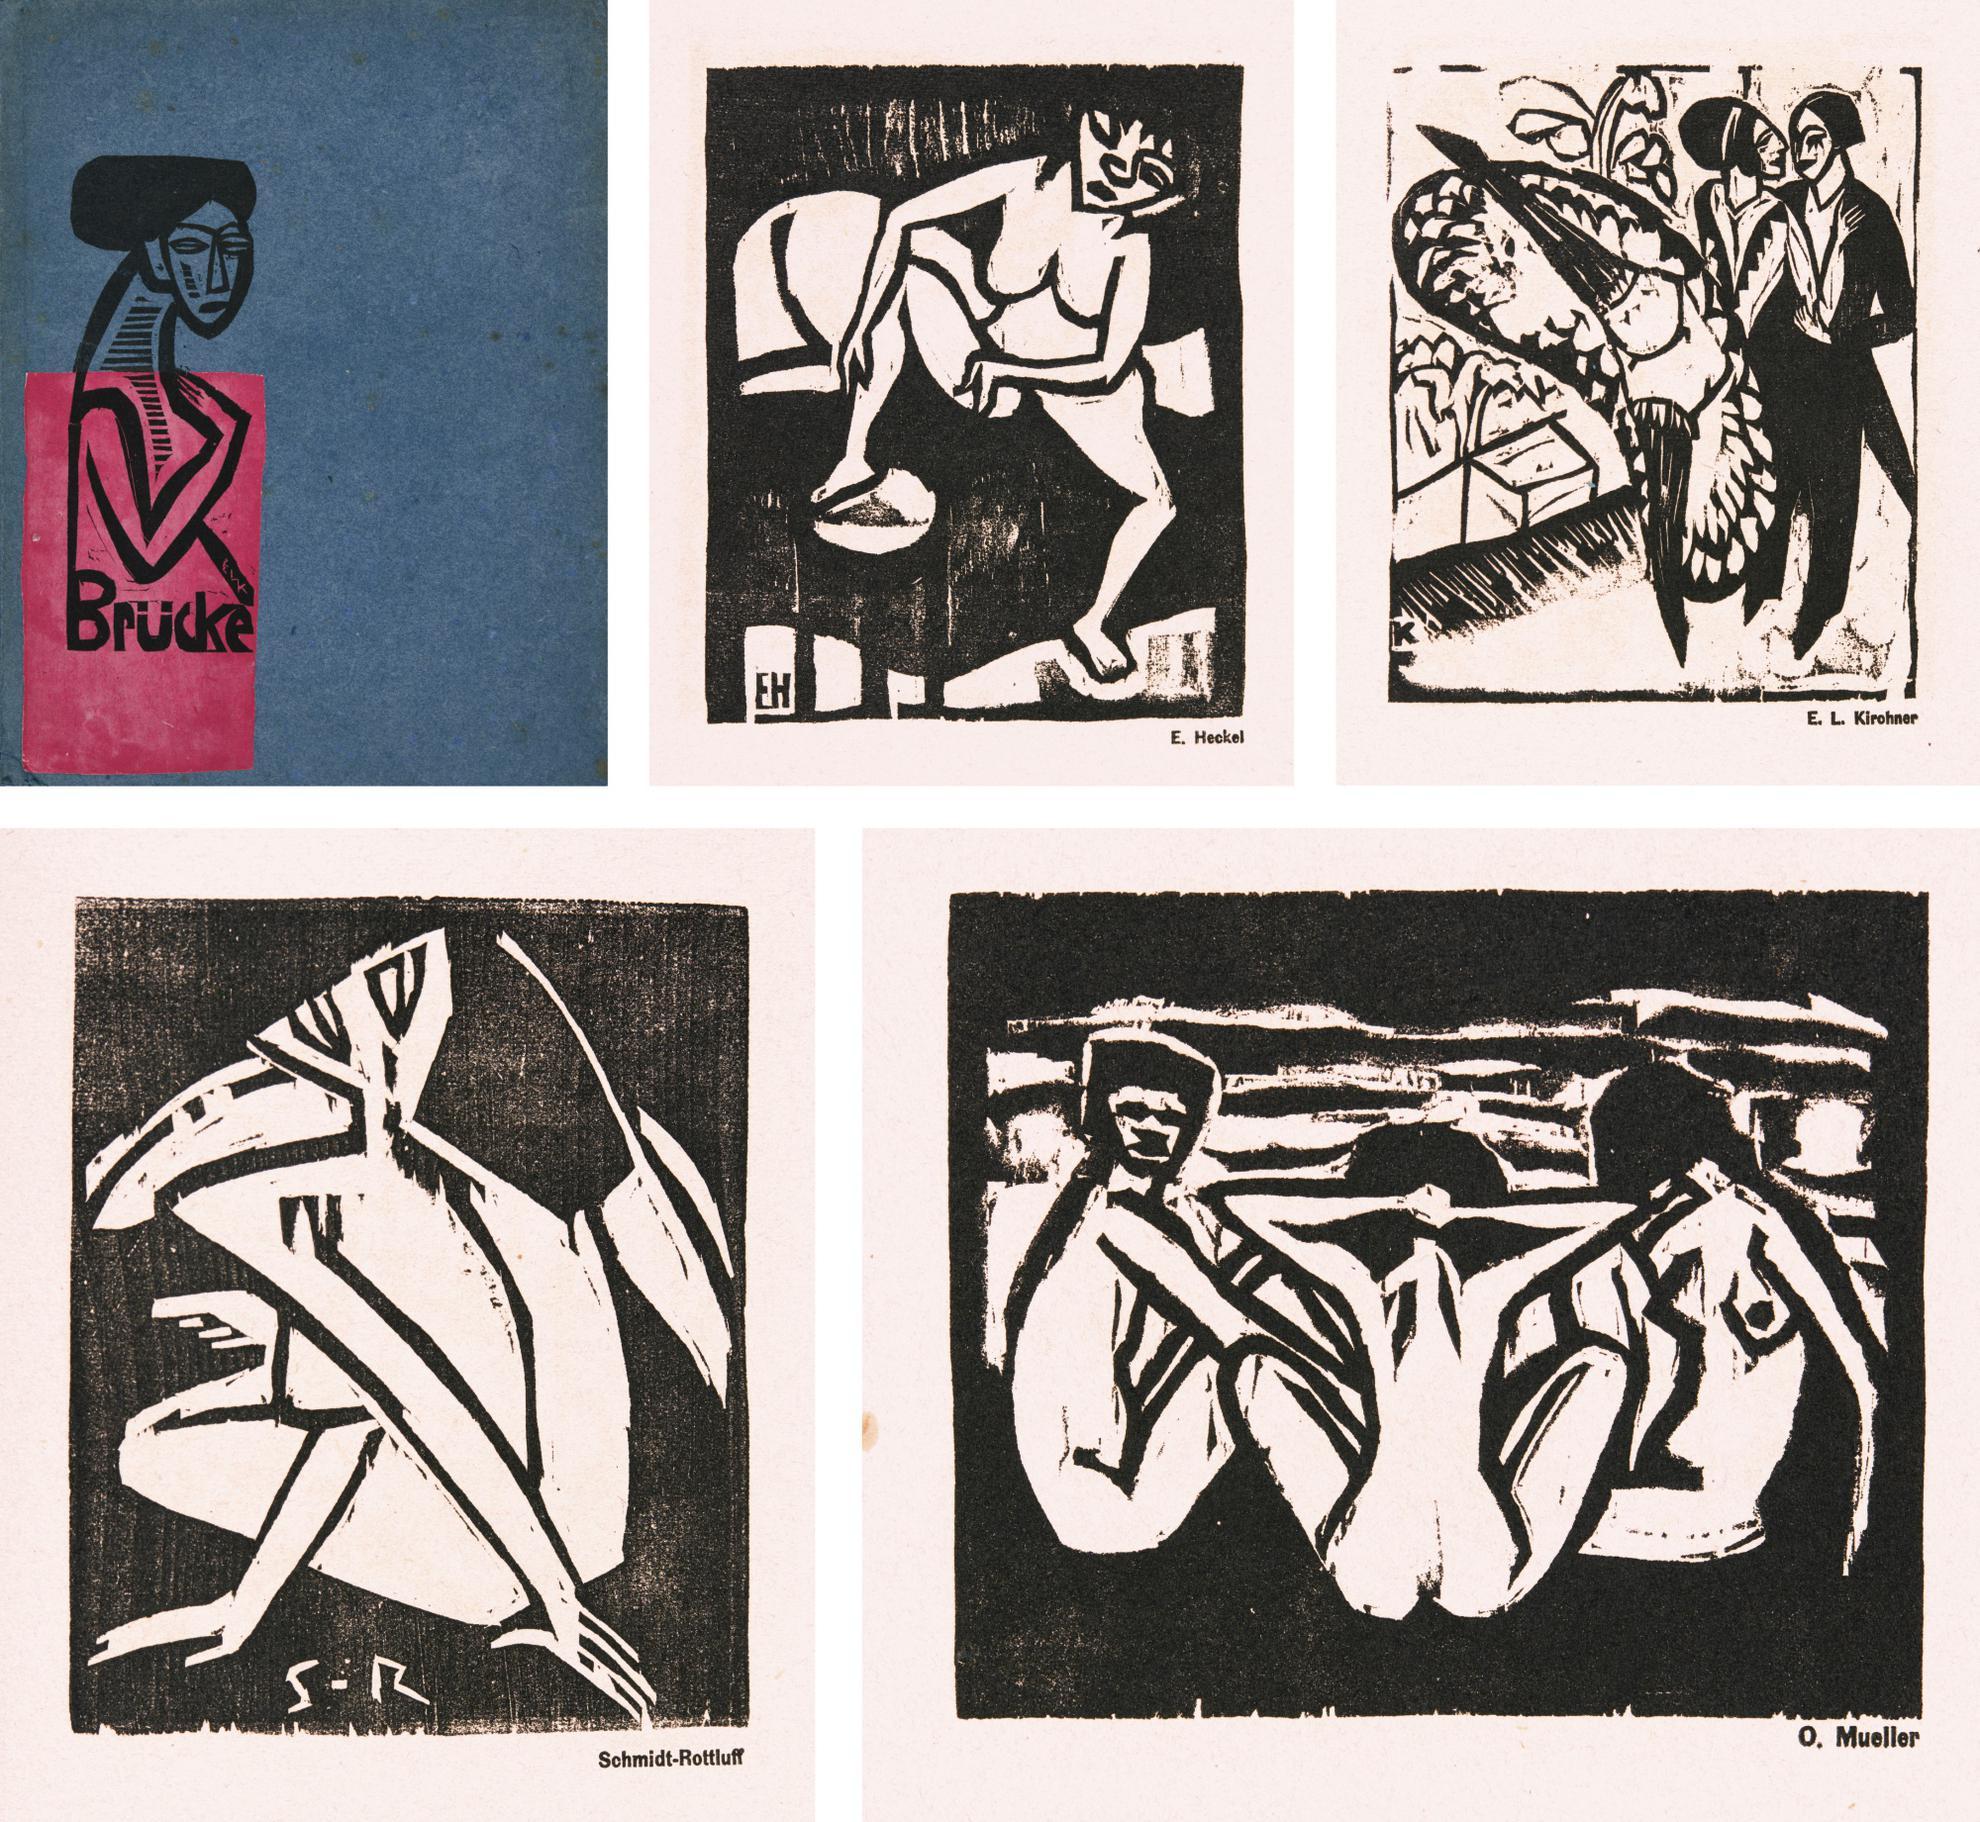 Kg Brucke - Ausstellung Der Kunstlergruppe Brucke Galerie Commeter, Hamburg (Kirchner Dube H727-730; Heckel Dube H226-228; Mueller Karsch 4; Schmidt-Rottluff Schapire 76, 97-98)-1912